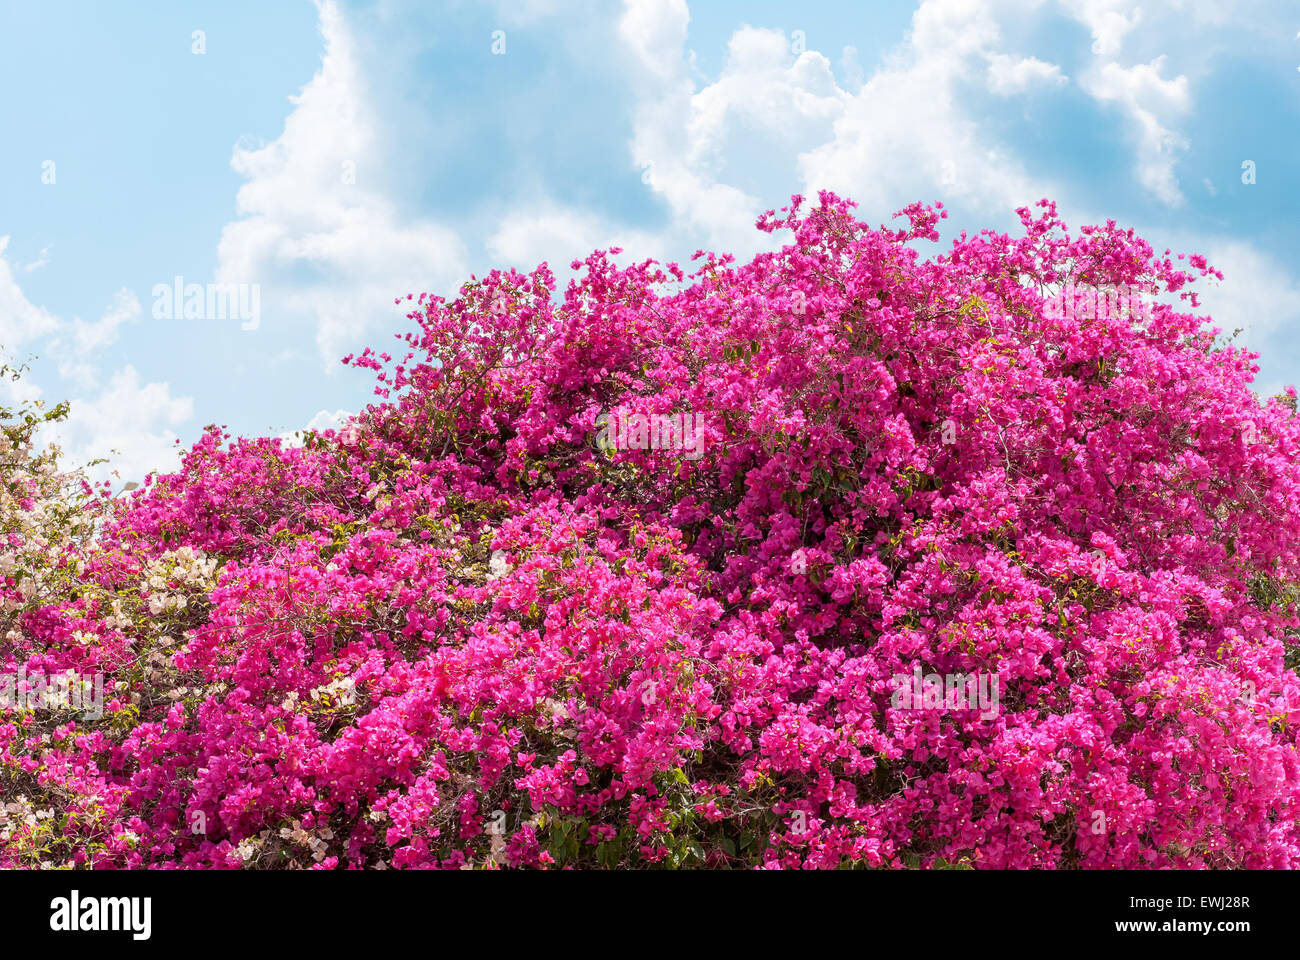 Big Bush Blooming Pink Flowers Azaleas Stock Photo 84604823 Alamy